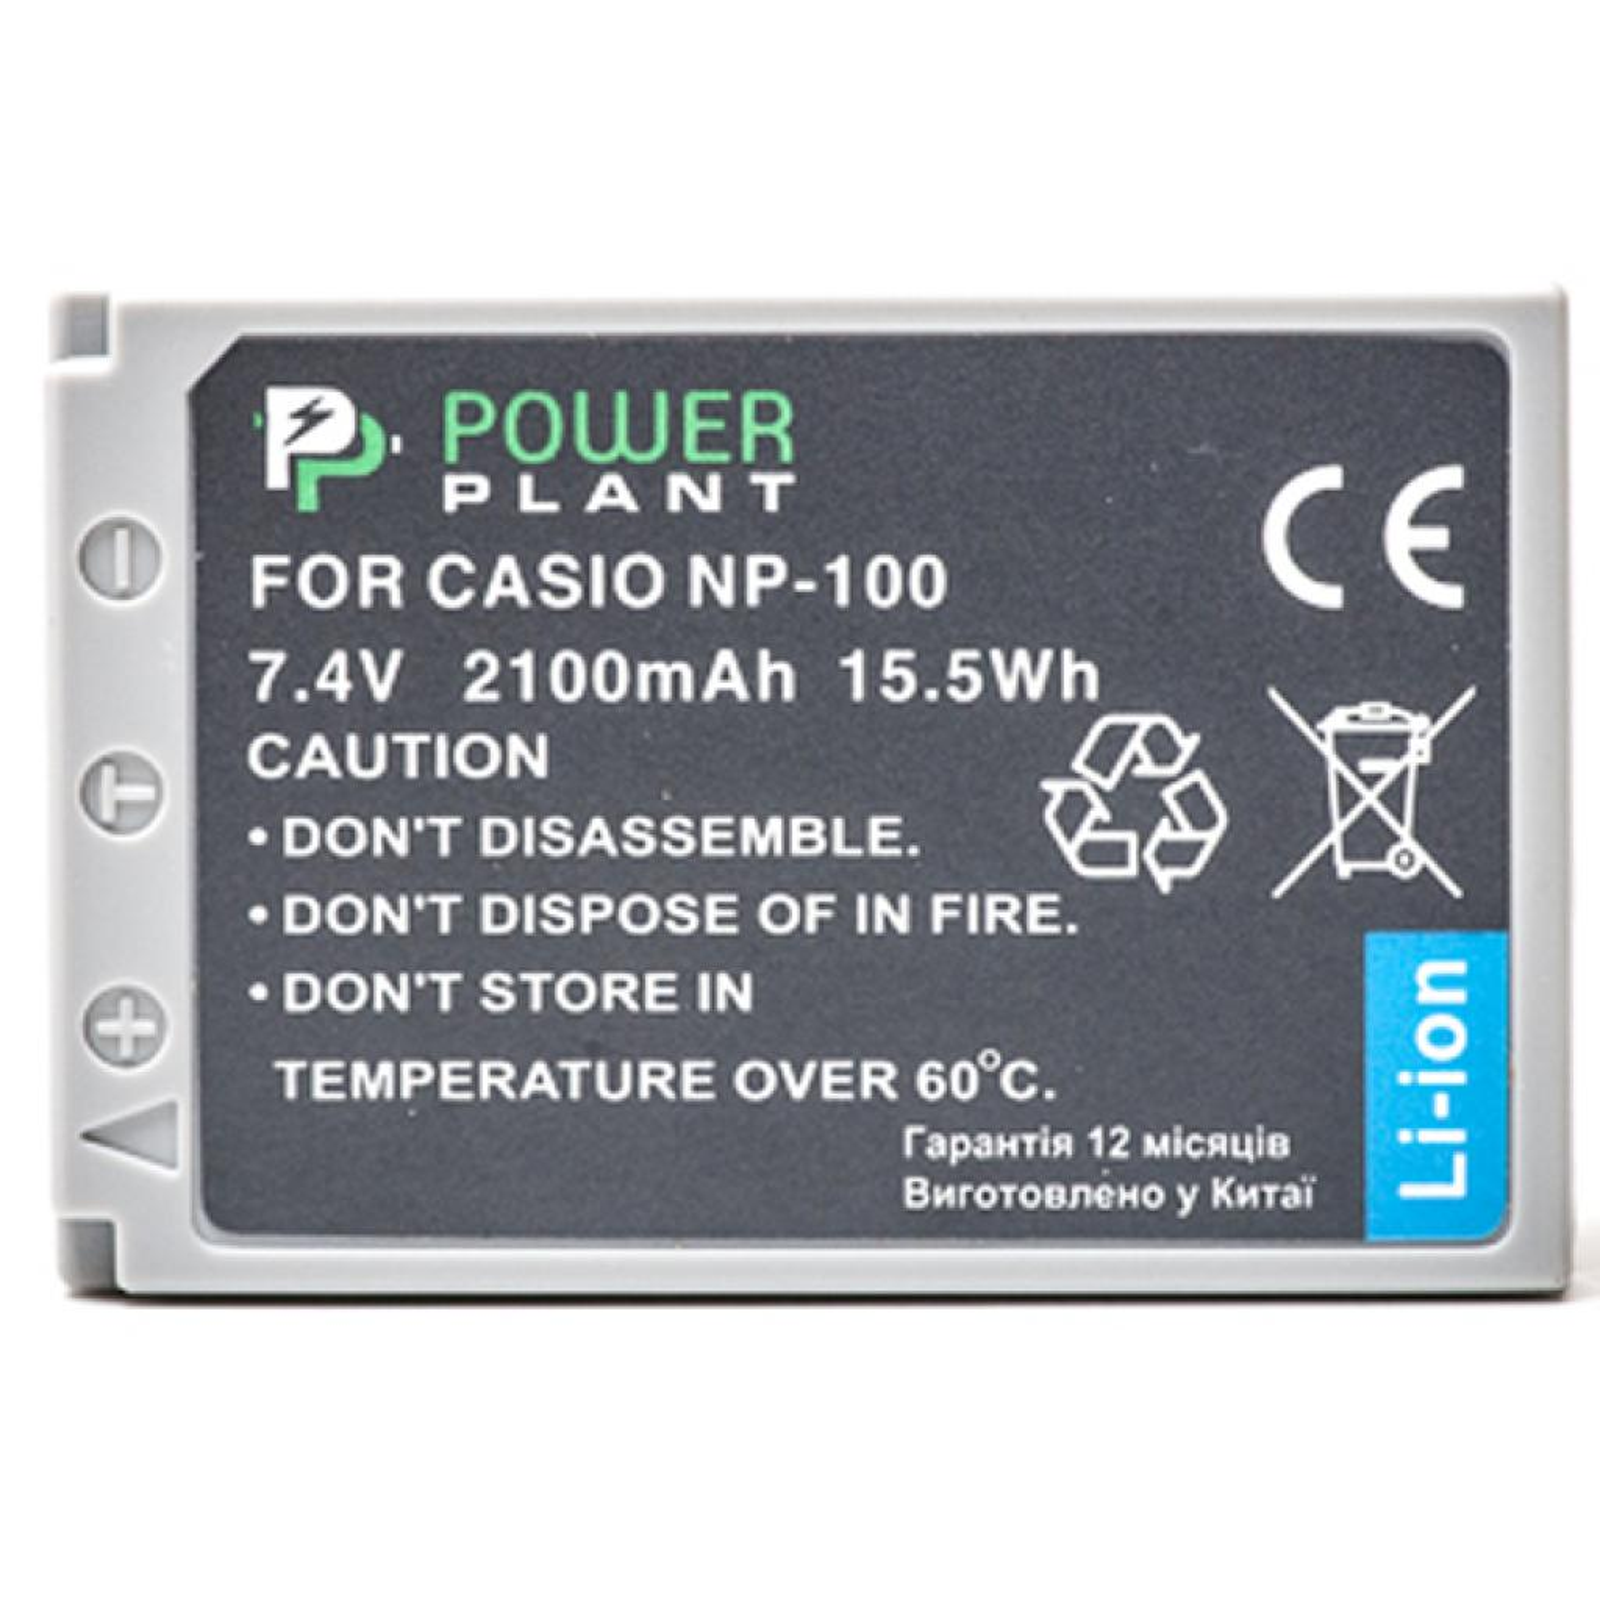 Аккумулятор к фото/видео PowerPlant Casio NP-100 (DV00DV1240) изображение 2